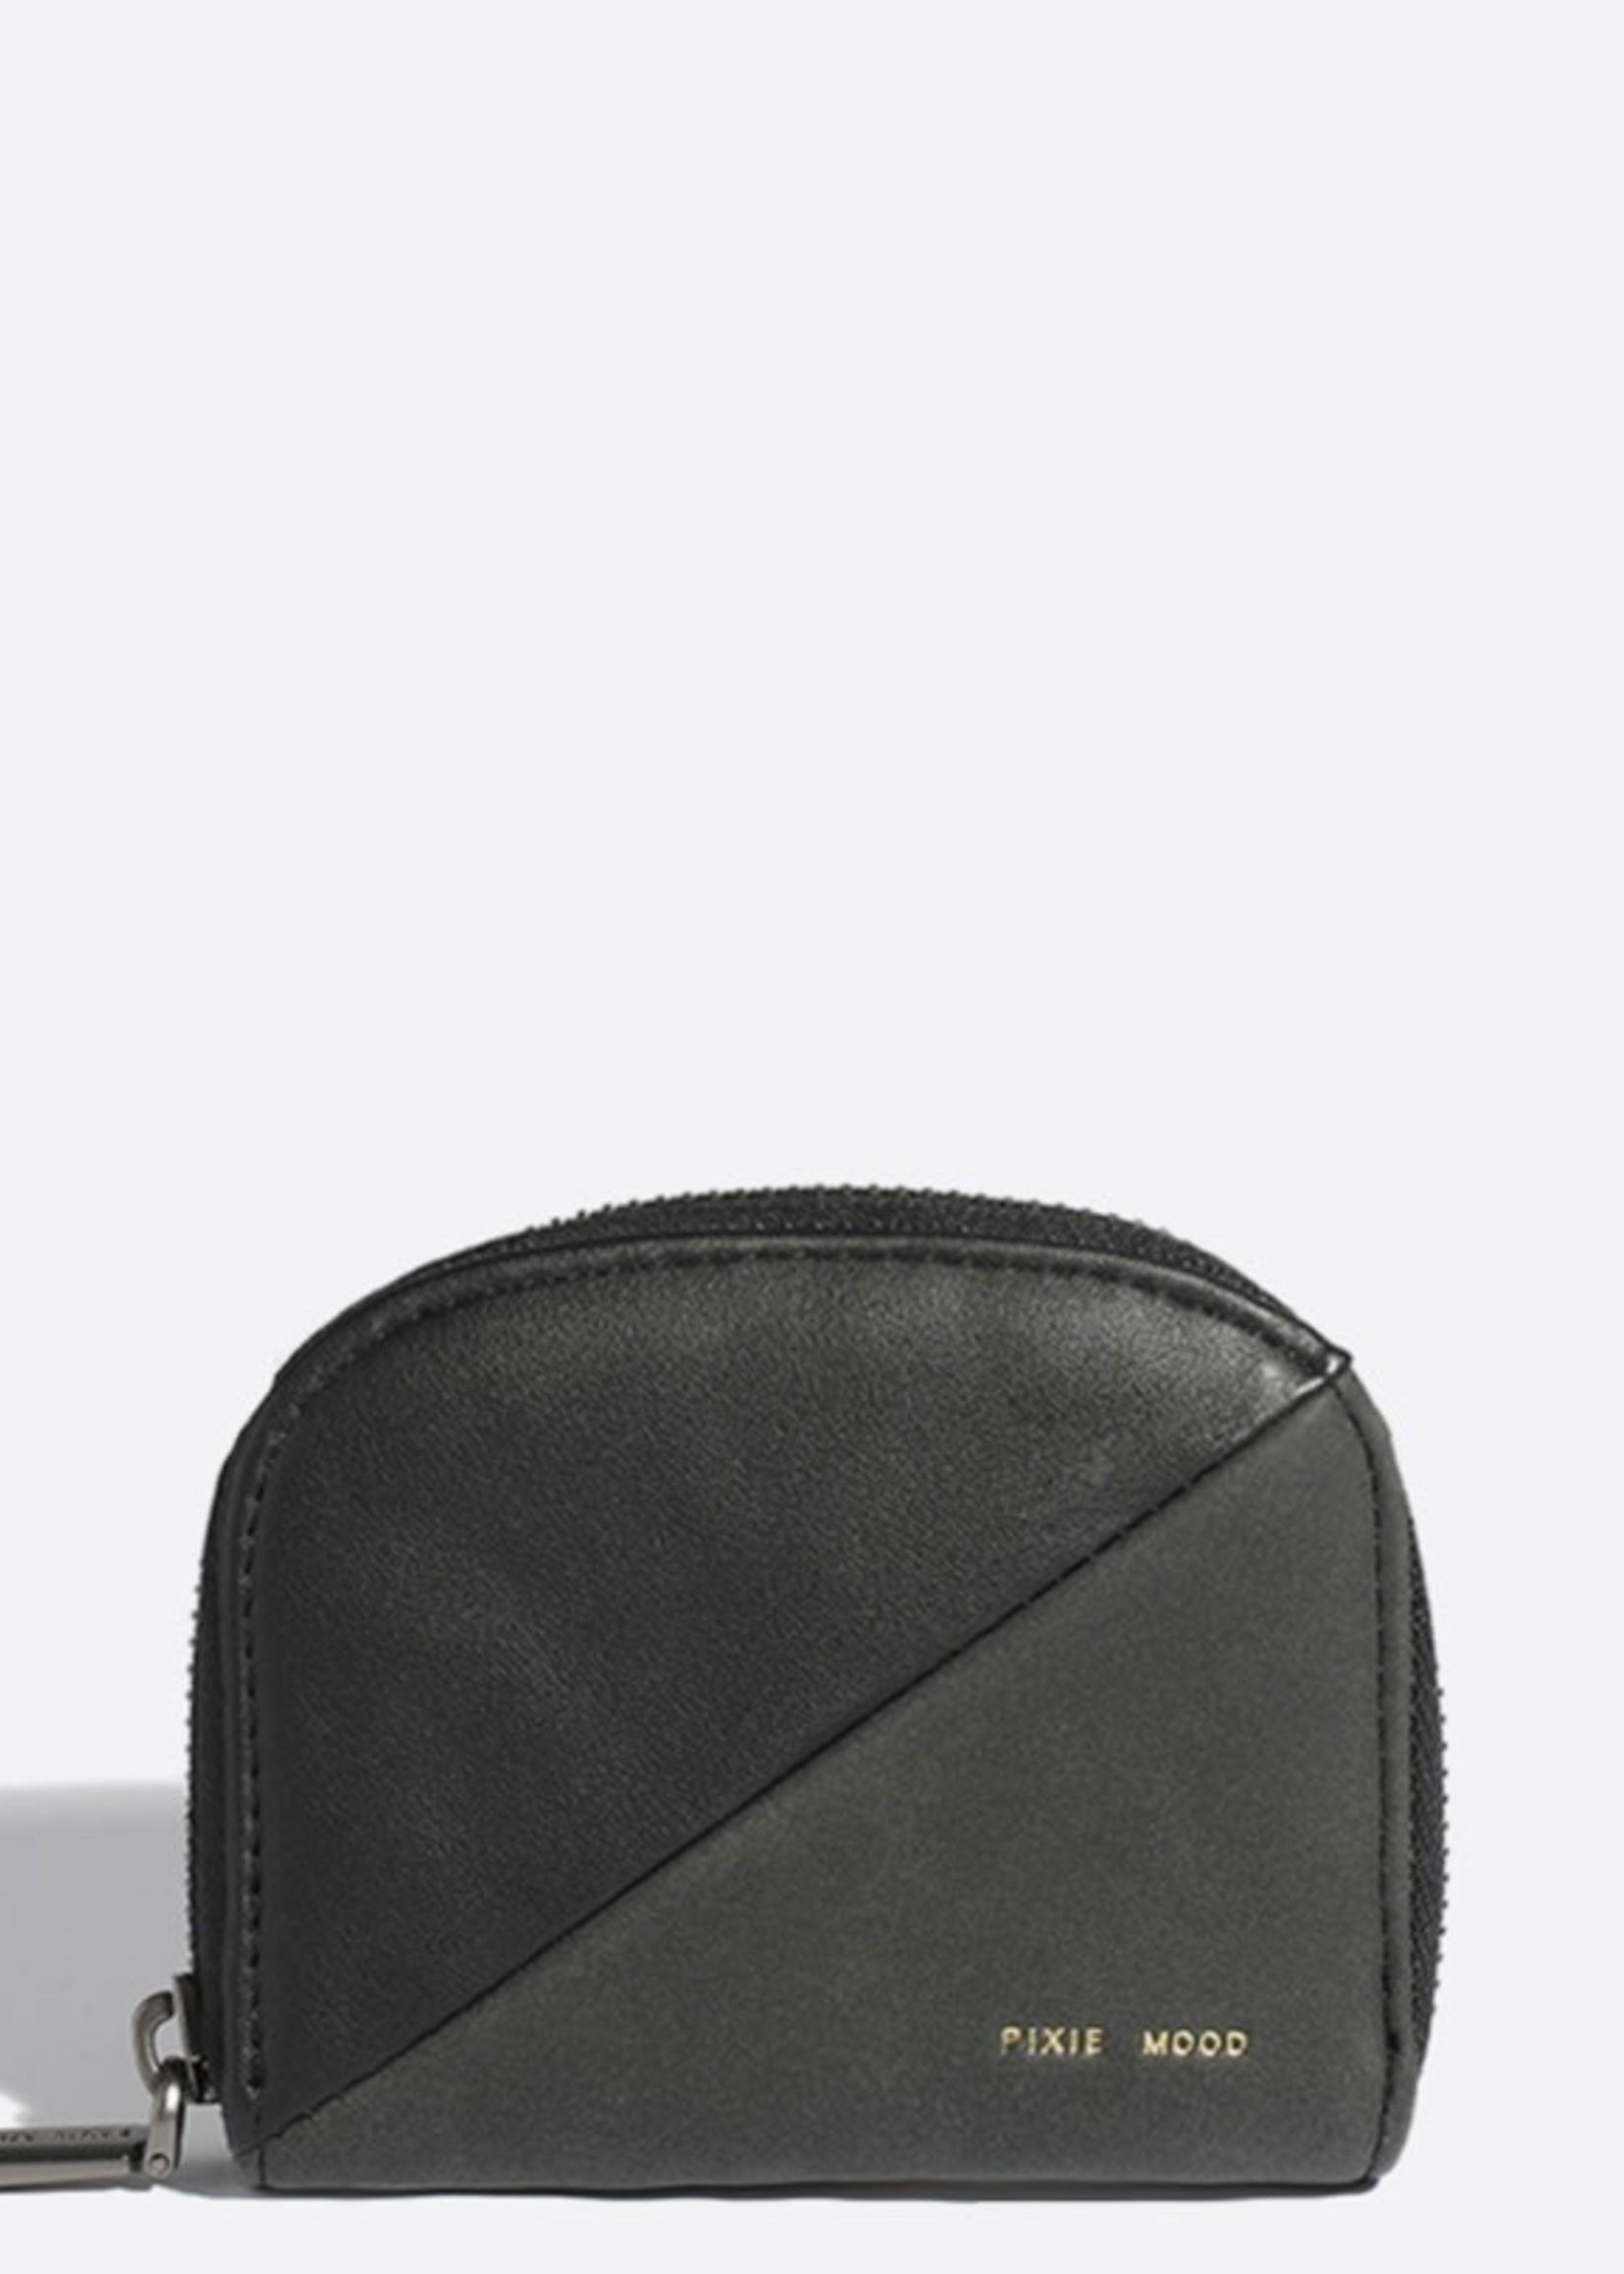 PIXIE MOOD Ida Card Case BLACK/NUBUCK